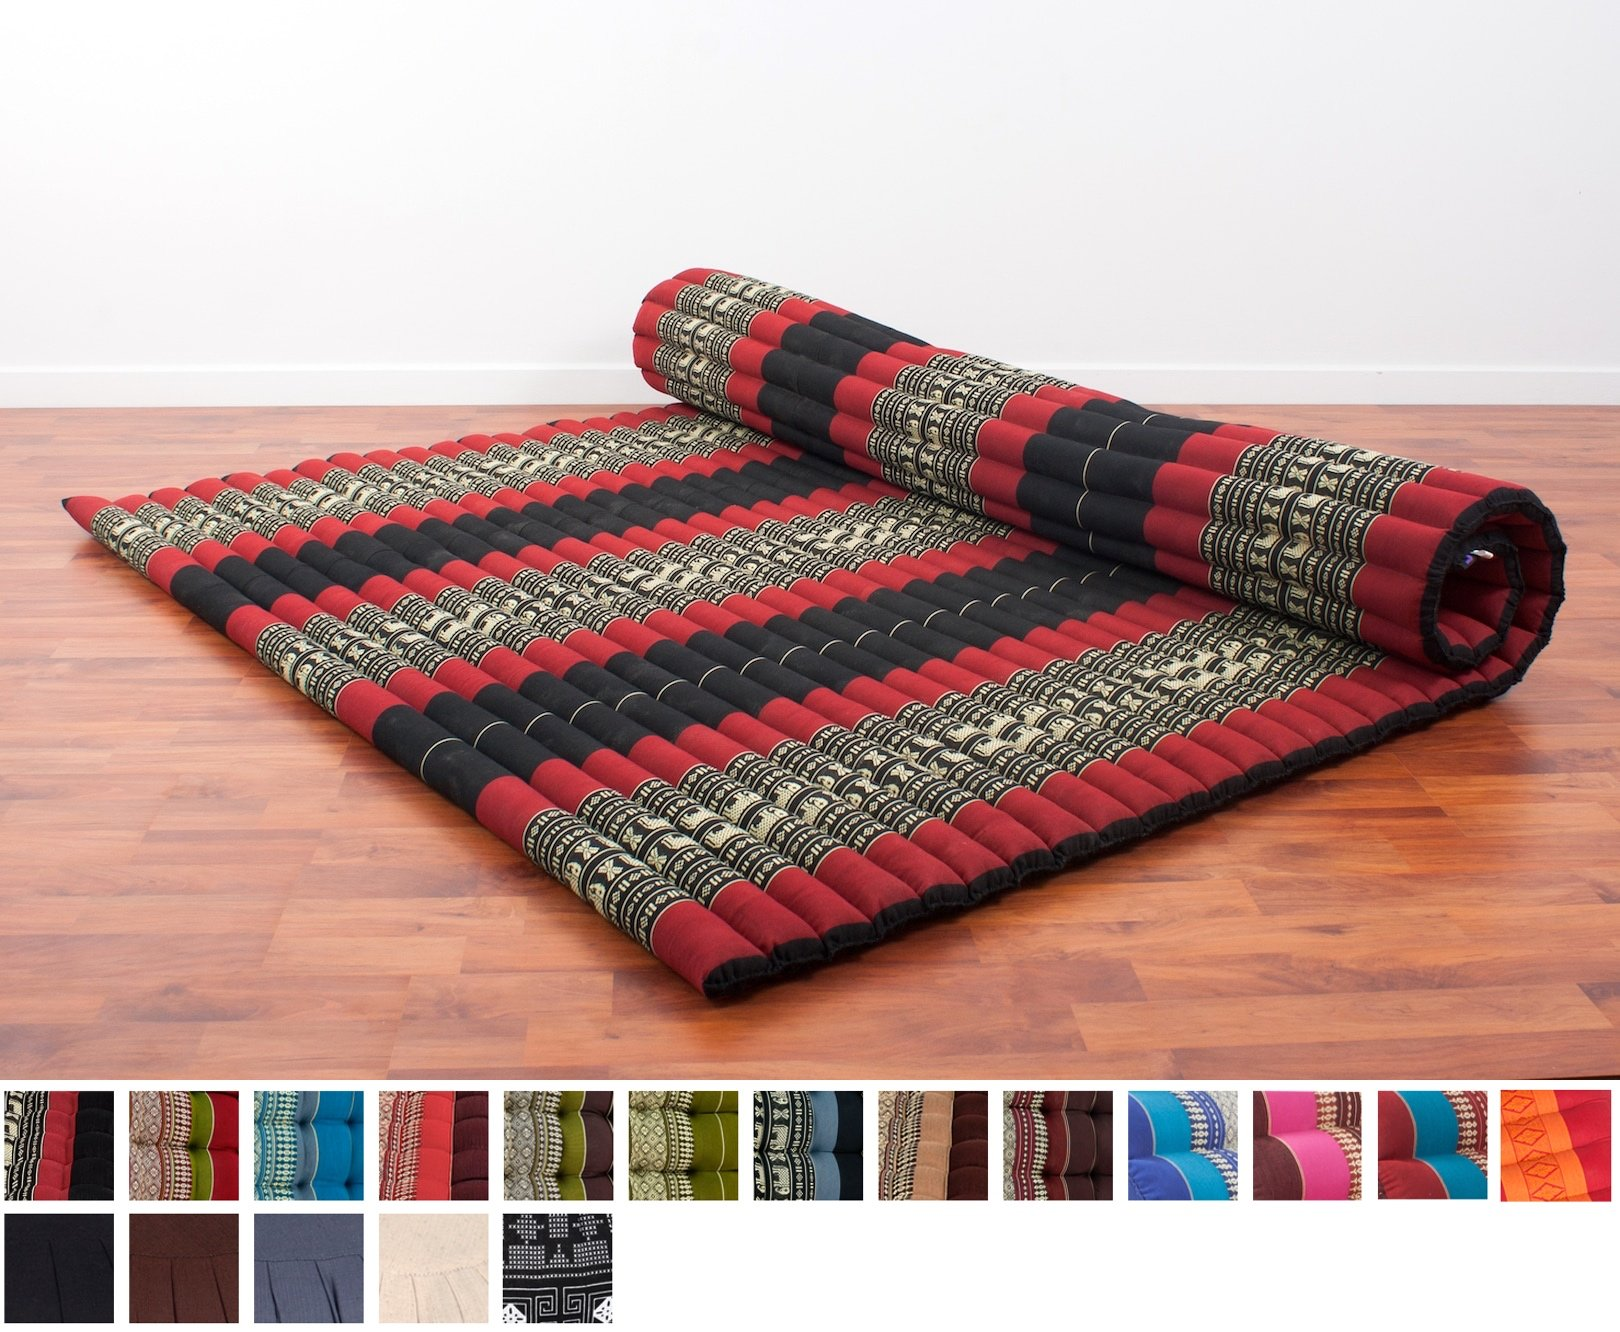 Leewadee Roll Up Thai Mattress XXL, 79x59x2 inches, Kapok Fabric, Black Red, Premium Double Stitched by Leewadee